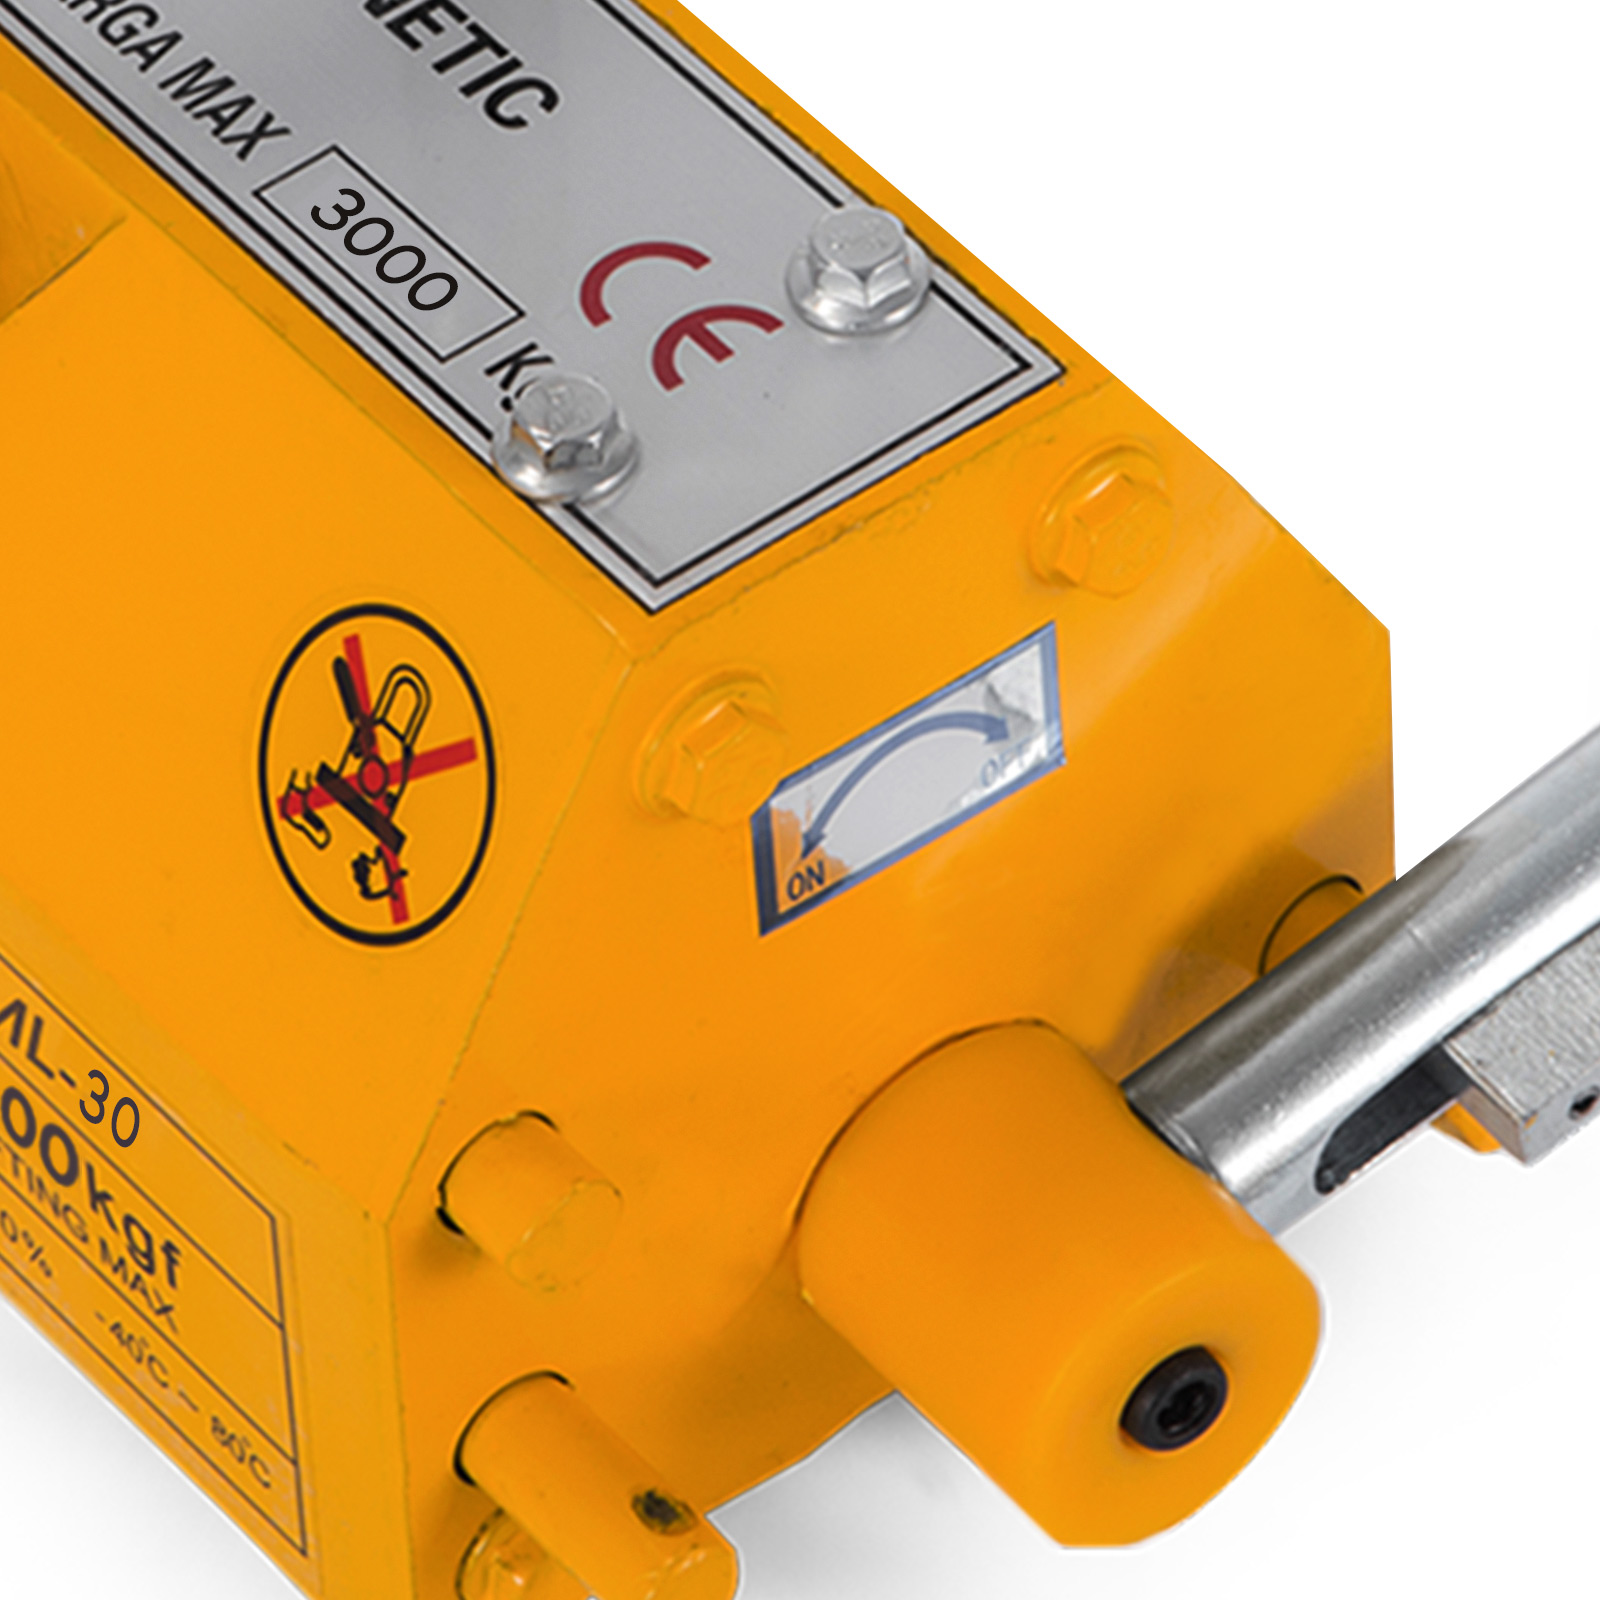 100-300-600-1000KG-Steel-Magnetic-Lifter-Heavy-Duty-Crane-Hoist-Lifting-Magnet miniature 104